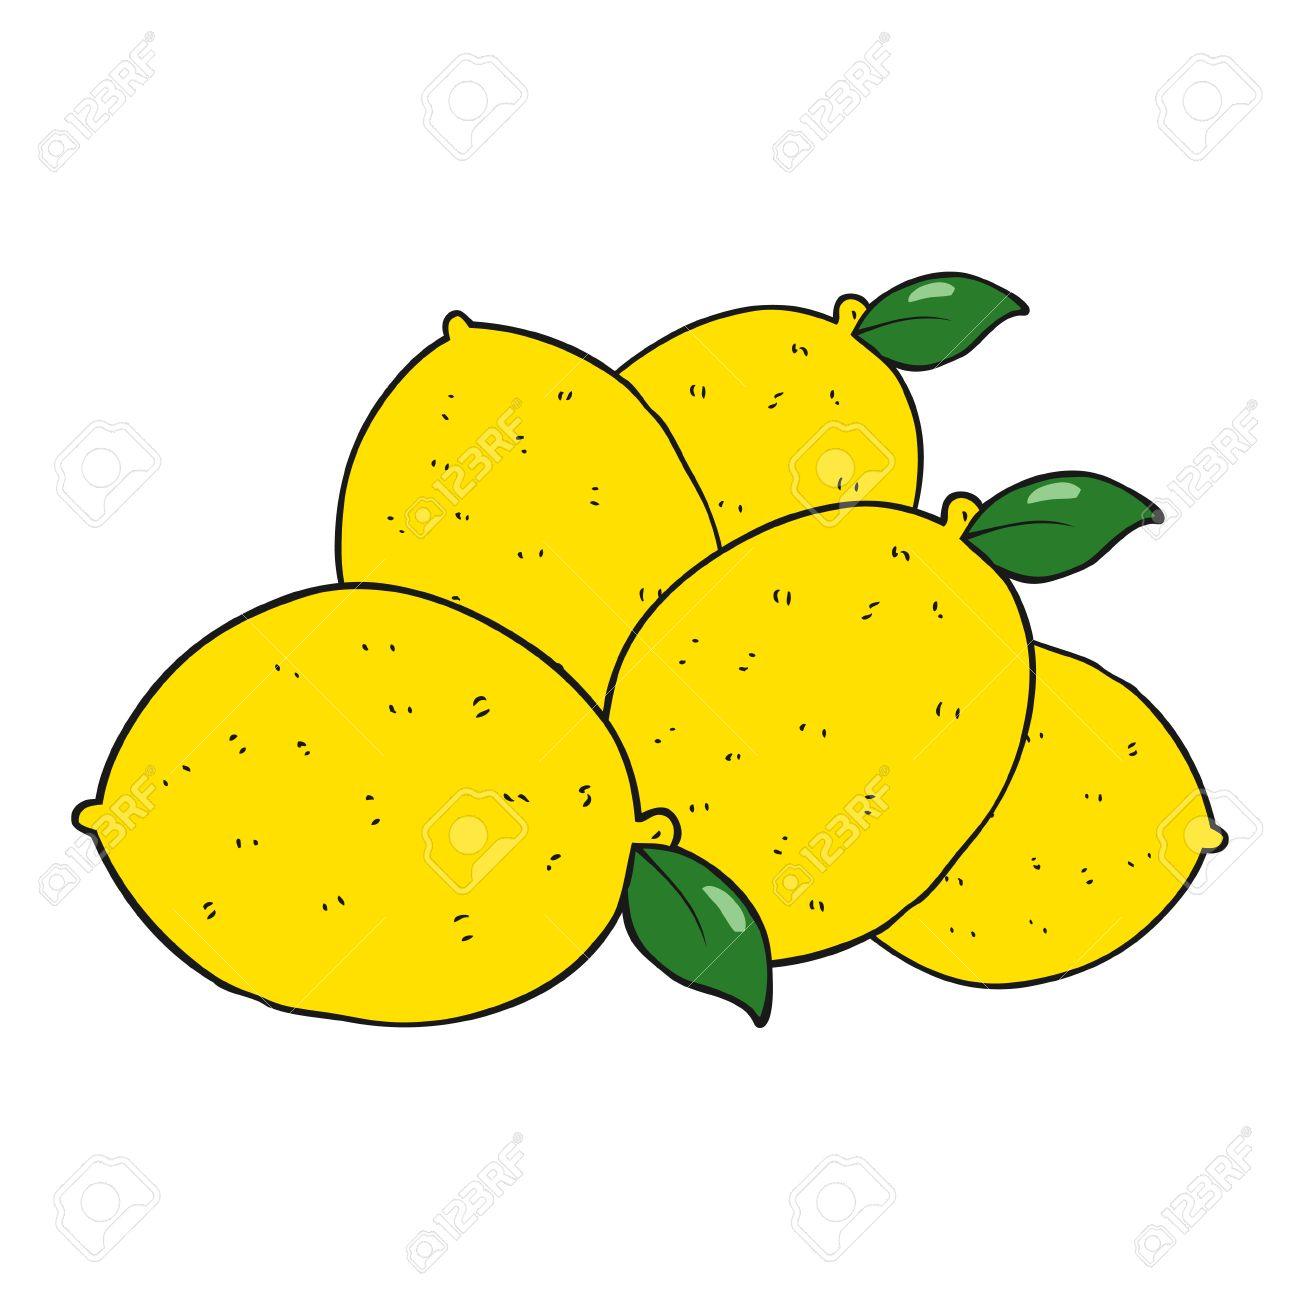 freehand drawn cartoon lemons royalty free cliparts vectors and rh 123rf com cartoon lemon images cartoon monster trucks